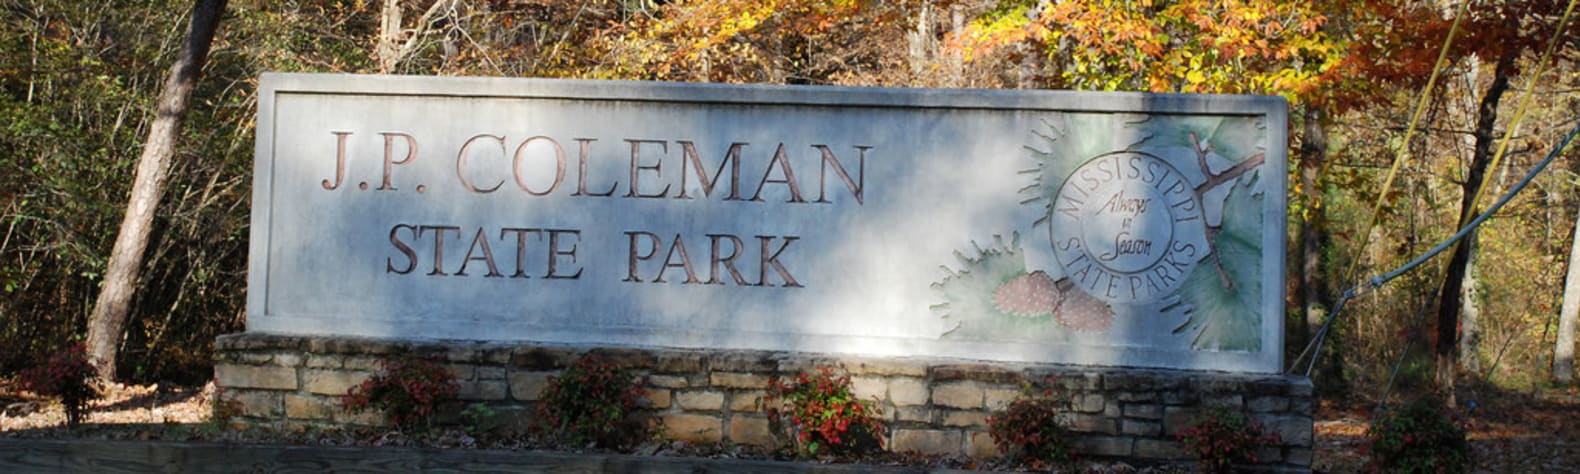 J.P. Coleman State Park